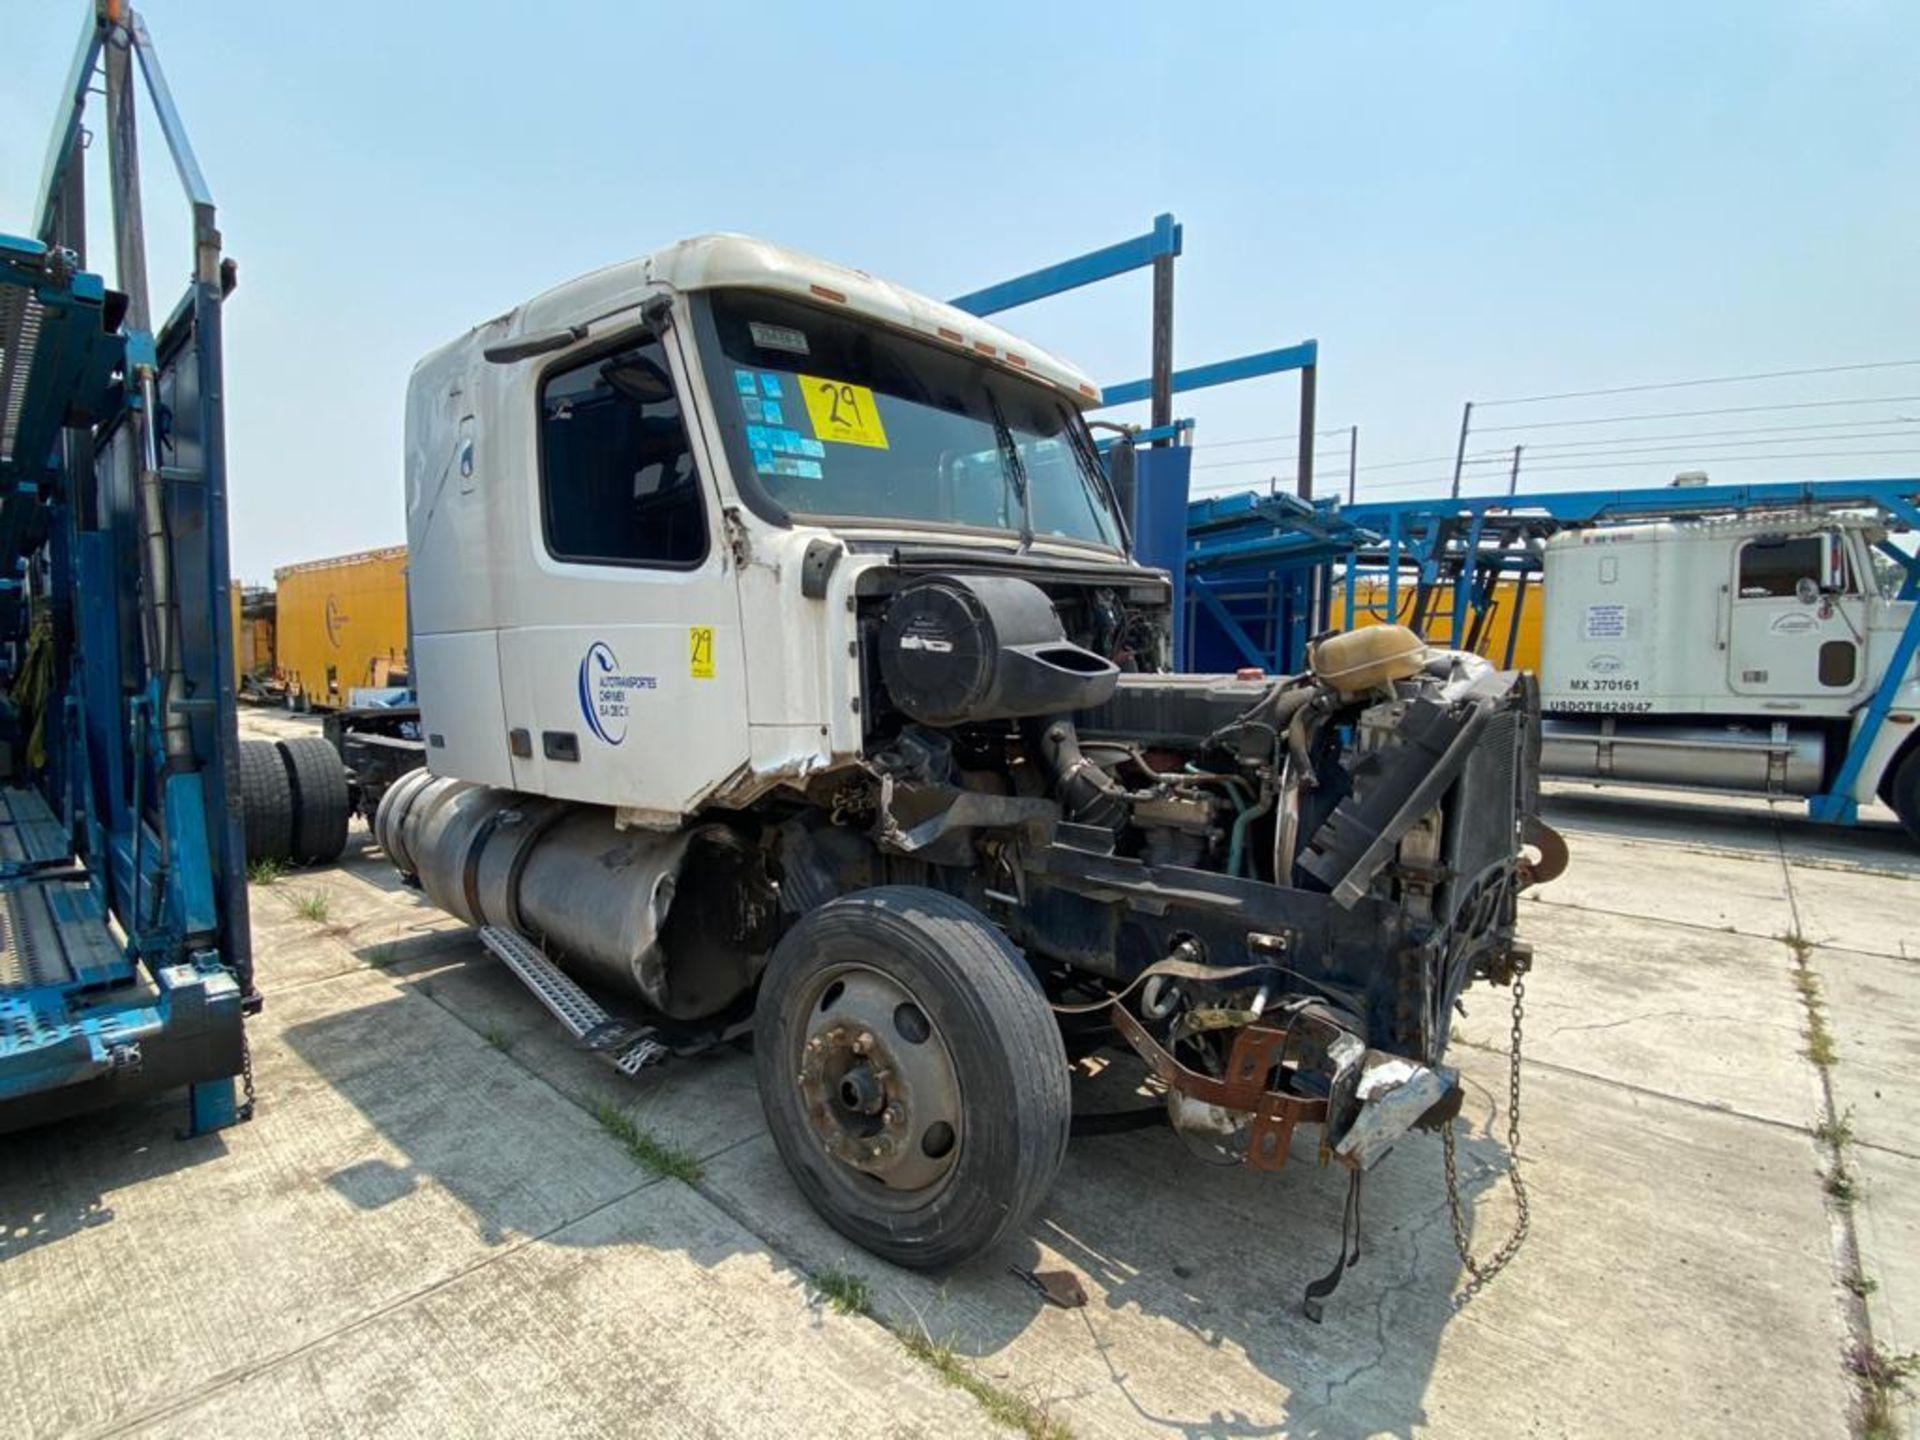 2001 Volvo Sleeper Truck Tractor, estándar transmissión of 18 speeds, with Volvo motor - Image 2 of 60